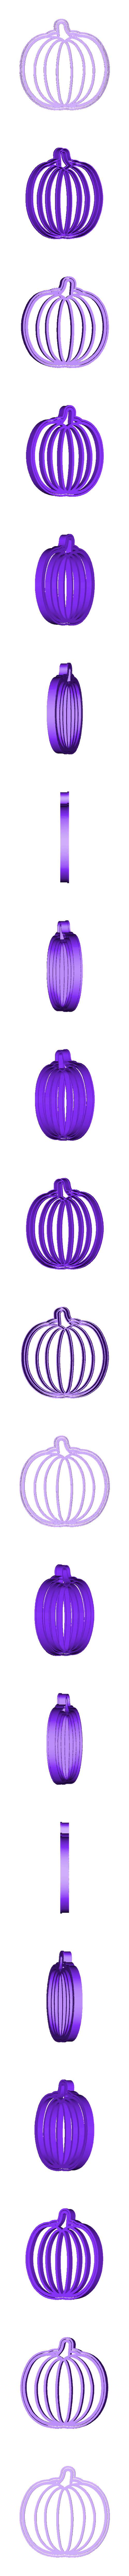 1.stl Télécharger fichier STL gratuit PACK CHAUSSURES ET CHAUSSURES - SCEAUX ECHANGEABLES - CHAUSSURES HALLOWEEN CUTTING - FONDANT MASS CUTTING AND pumpkin CLAY - 8 AND 10cm • Objet imprimable en 3D, Agos3D